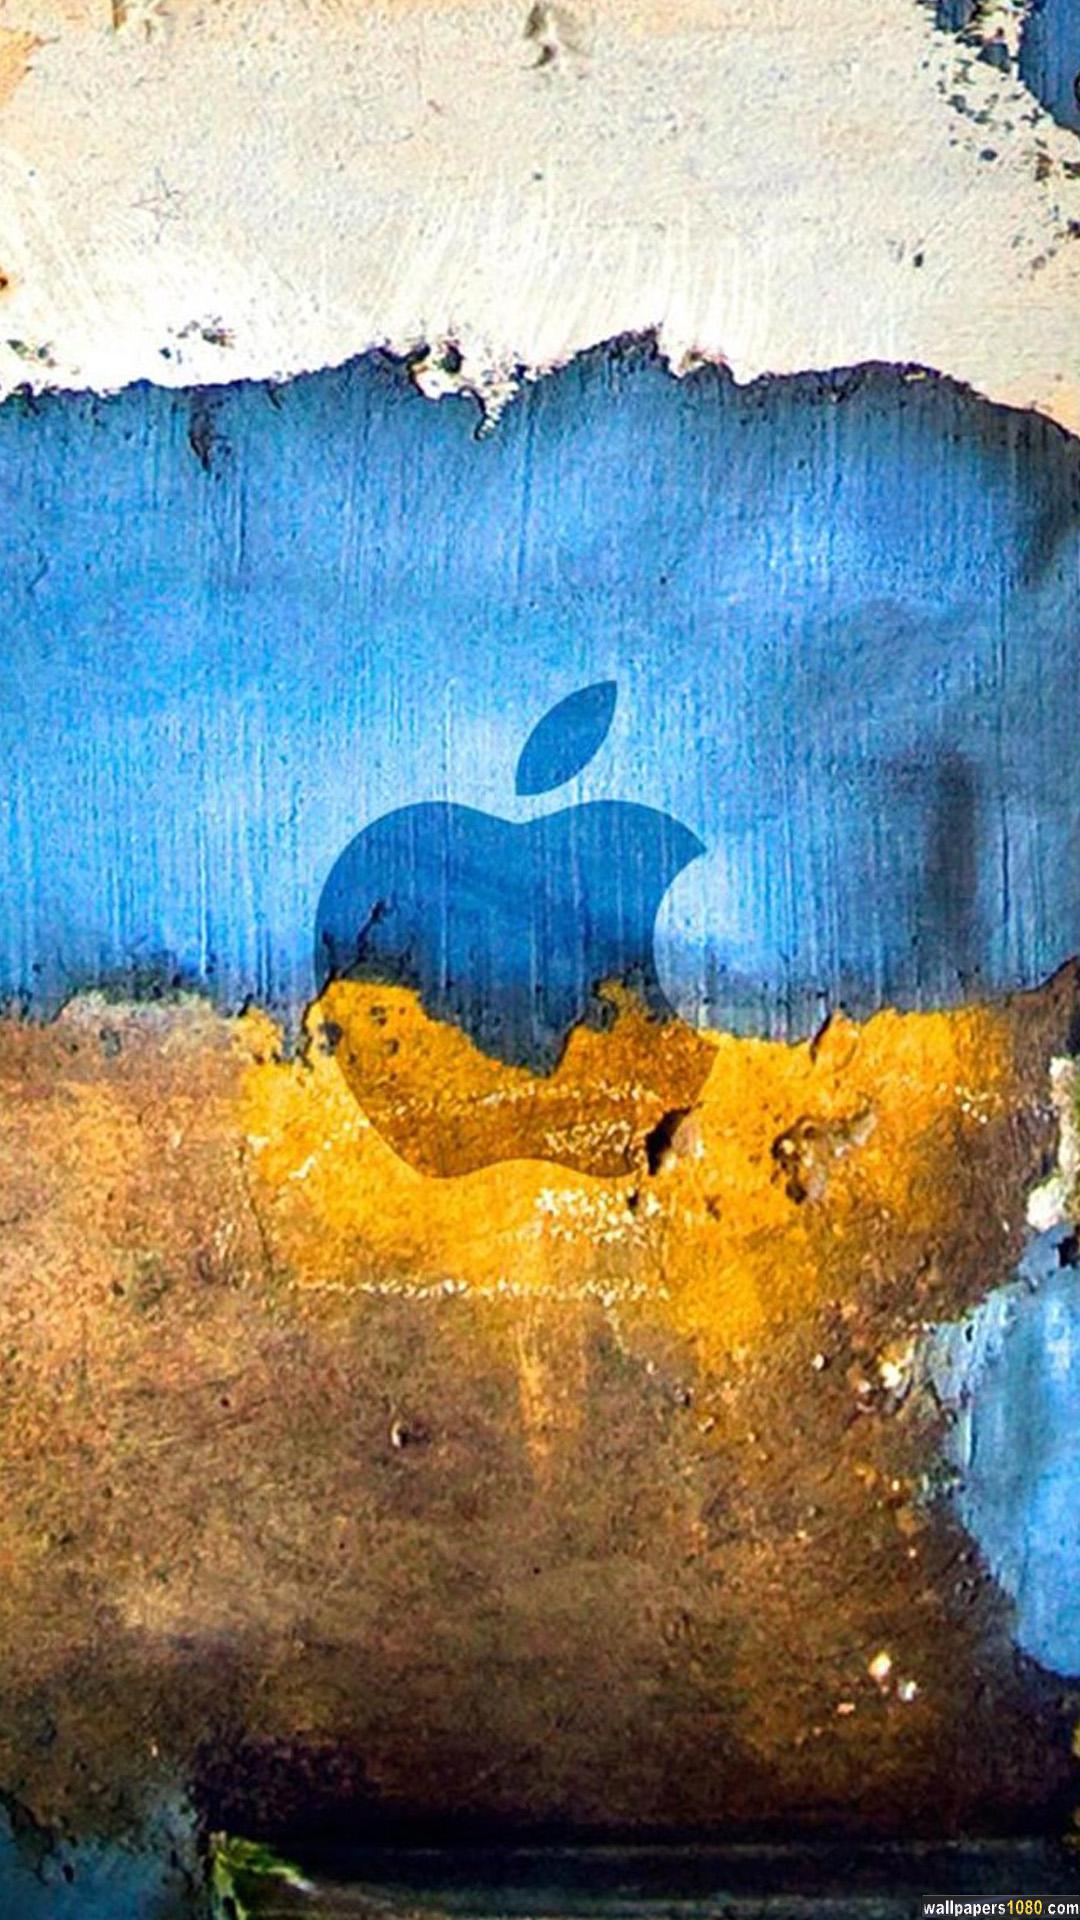 Apple iPhone 6 Plus Wallpaper 30 1080p Wallpapers Hd Wallpapers 1080x1920